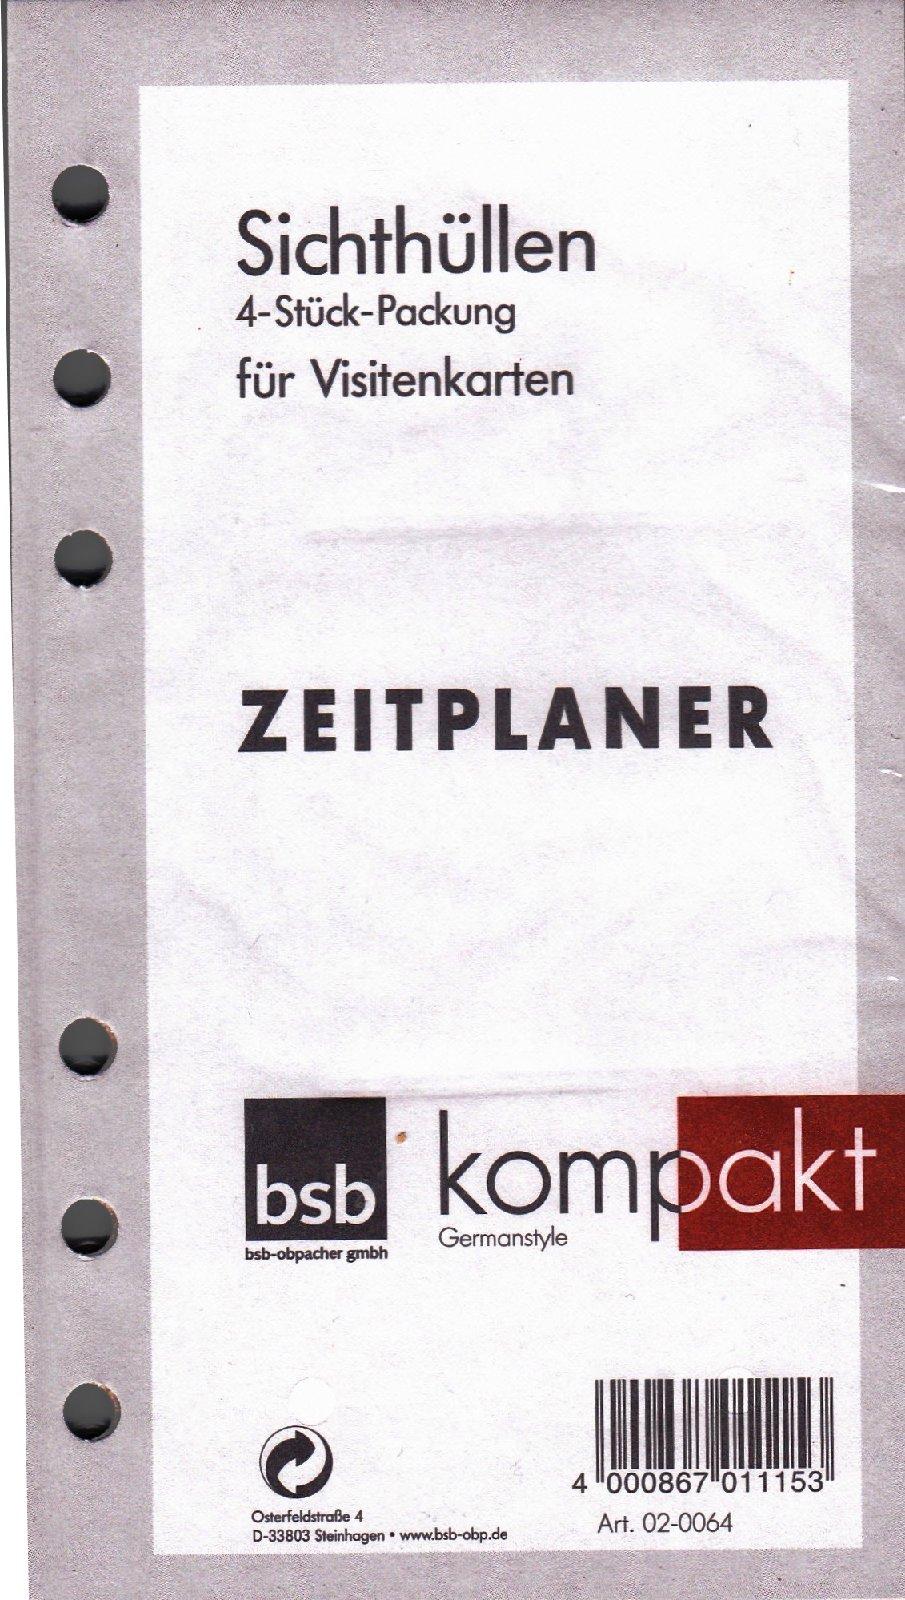 Organiser De Bsb Kompakt A6 Kalender Einlagen 4